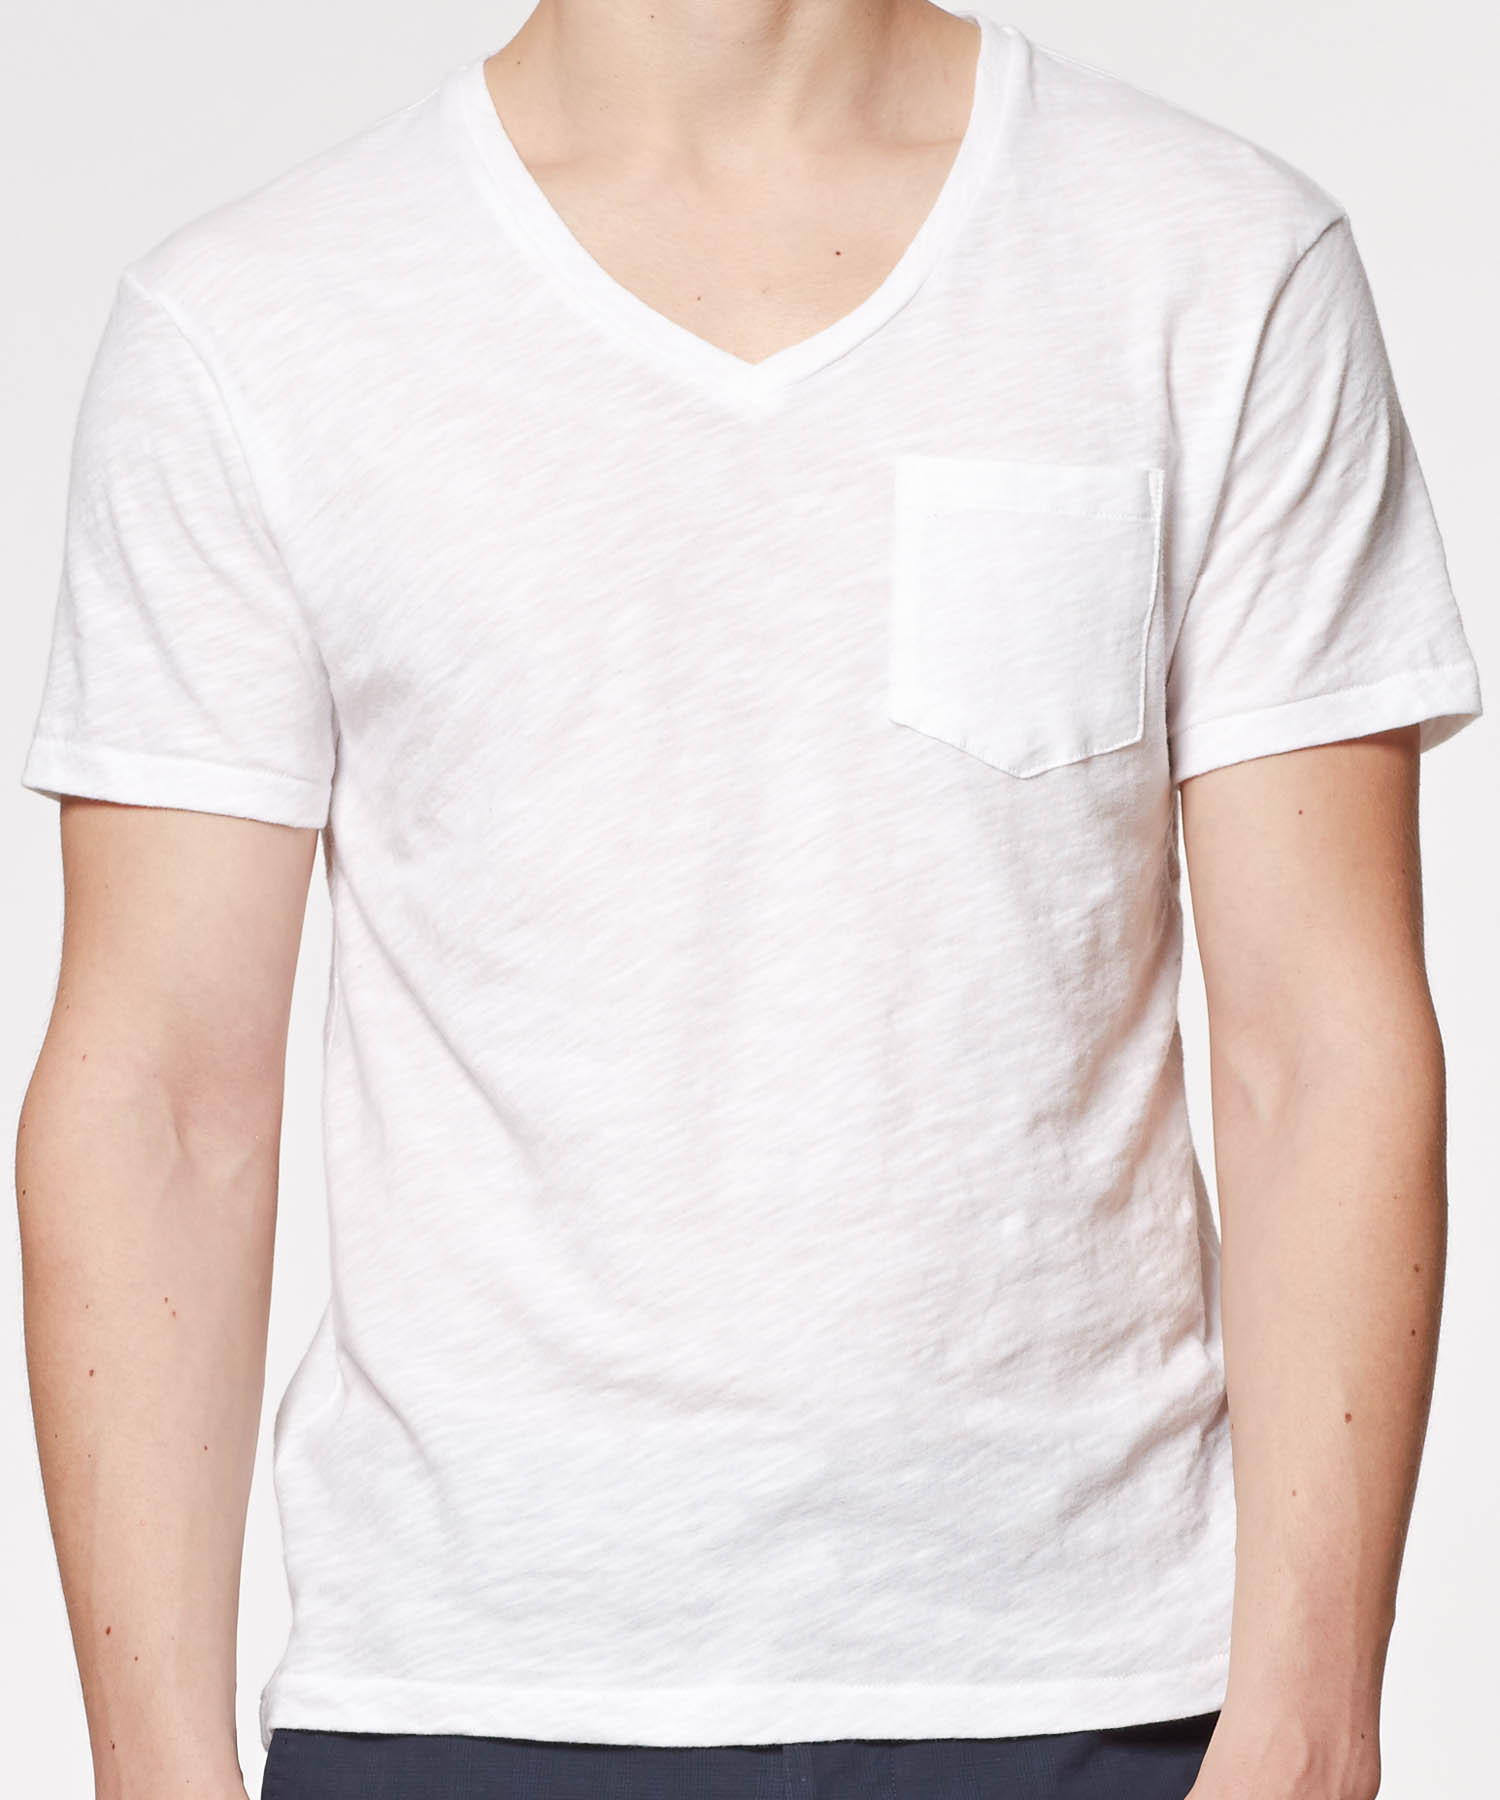 Mens Pocket Tee Shirts Images White Ideas Decorating